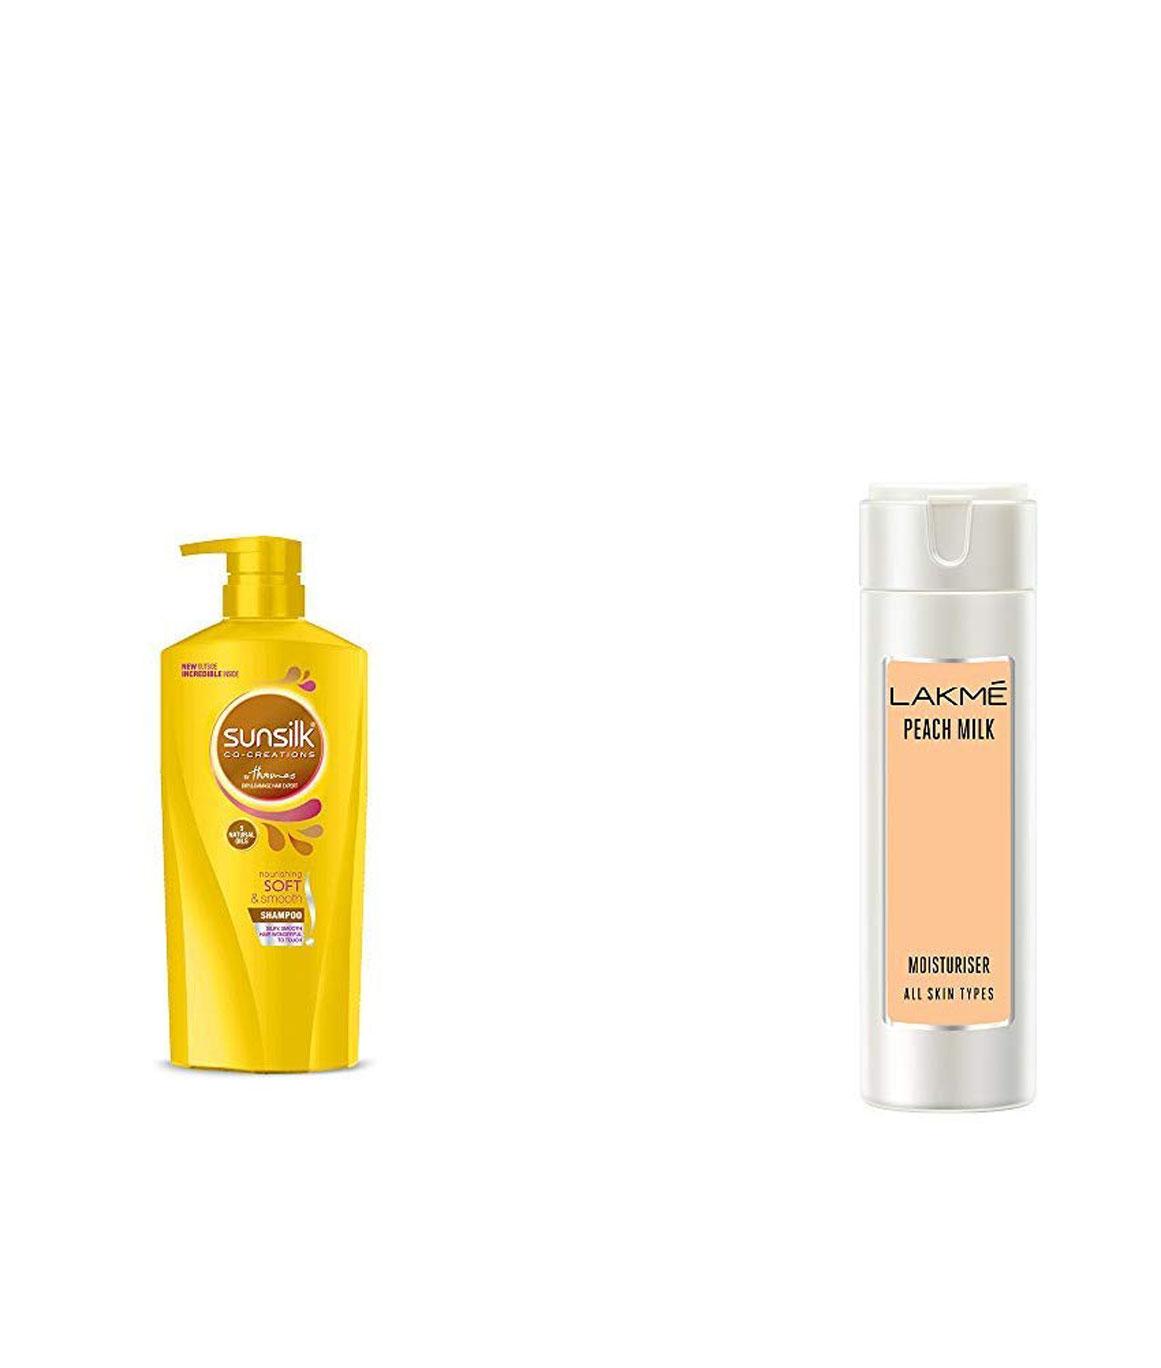 Sunsilk Nourishing Soft & Smooth Shampoo 650ml & Lakme Peach Milk Moisturizer Body Lotion 200 ml